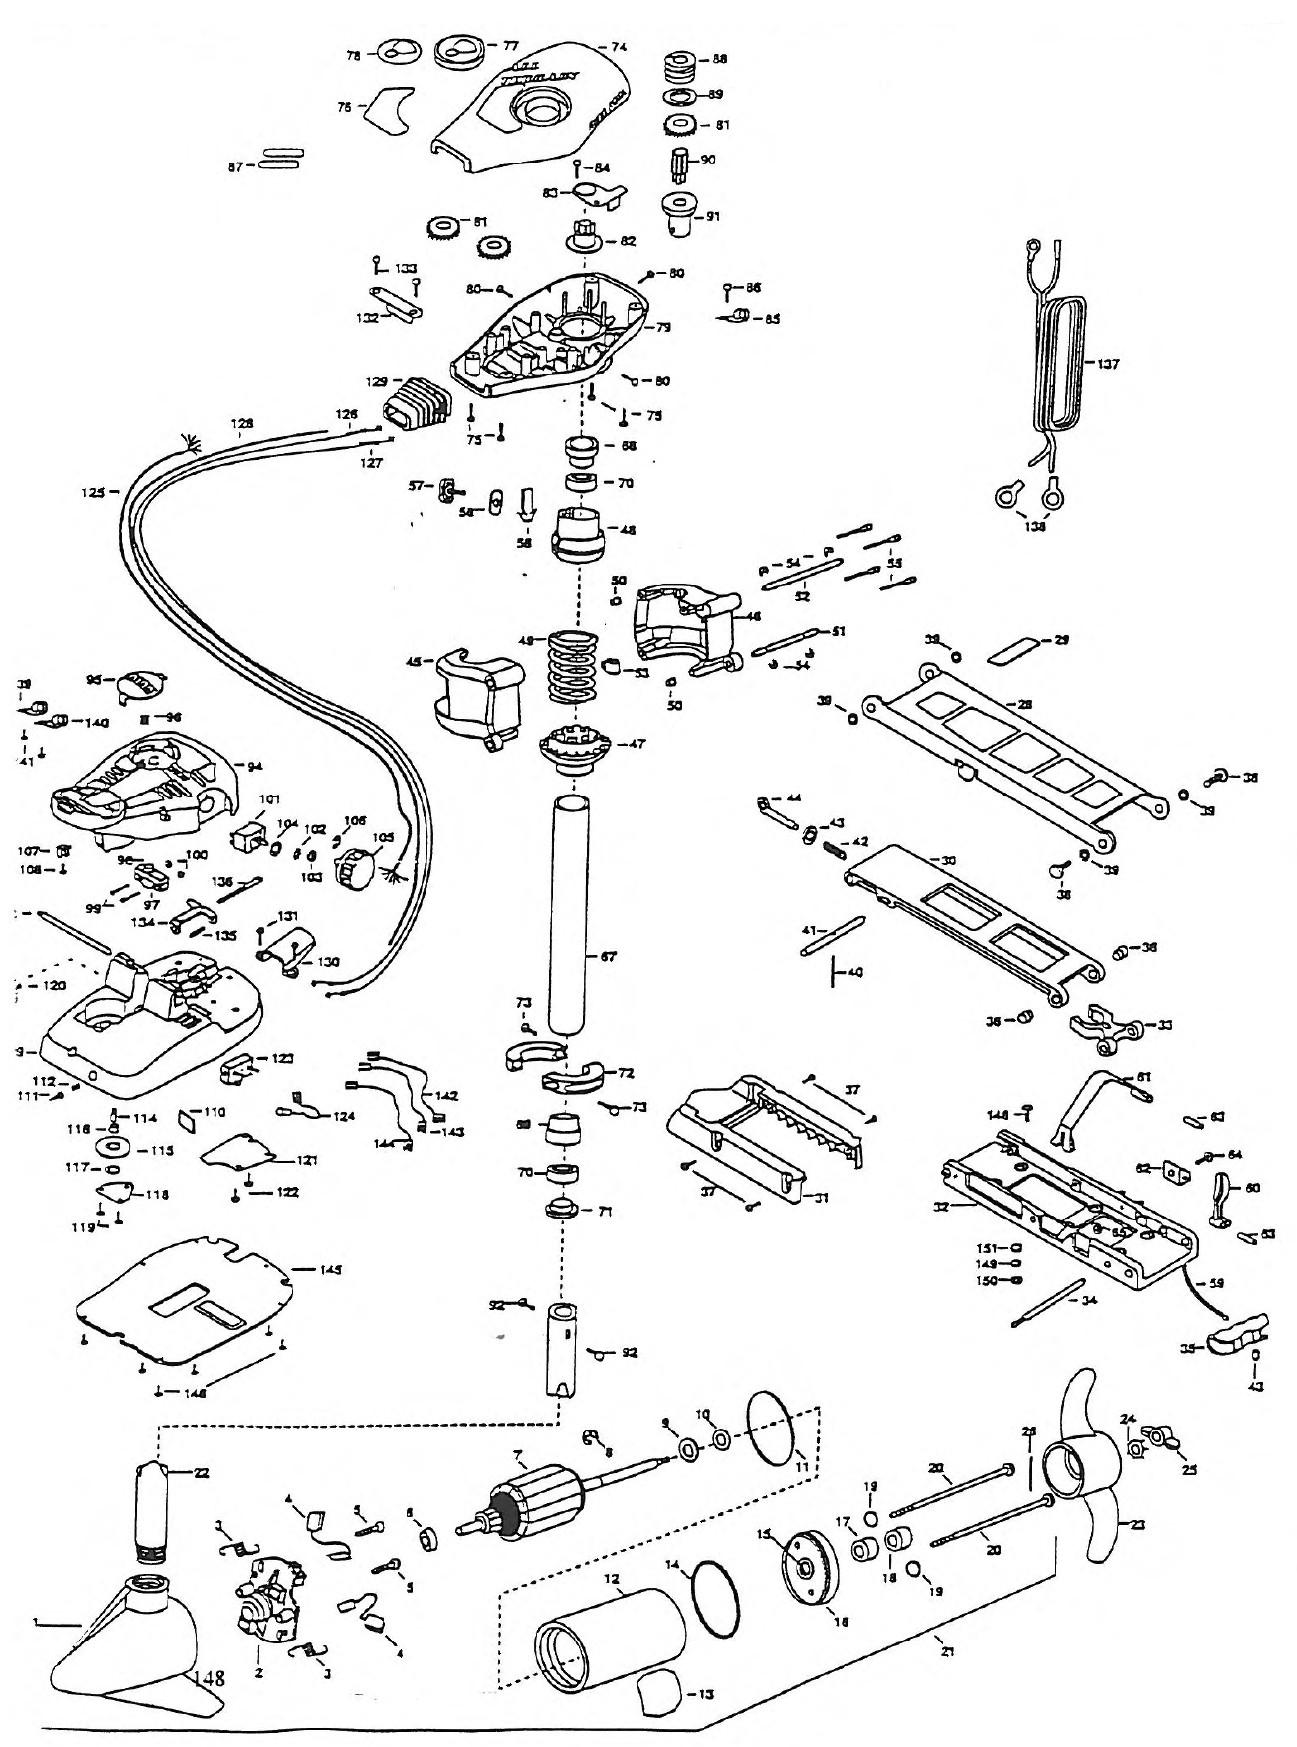 1973 glastron wiring diagram glastron wiring diagram wiring diagram data  glastron wiring diagram wiring